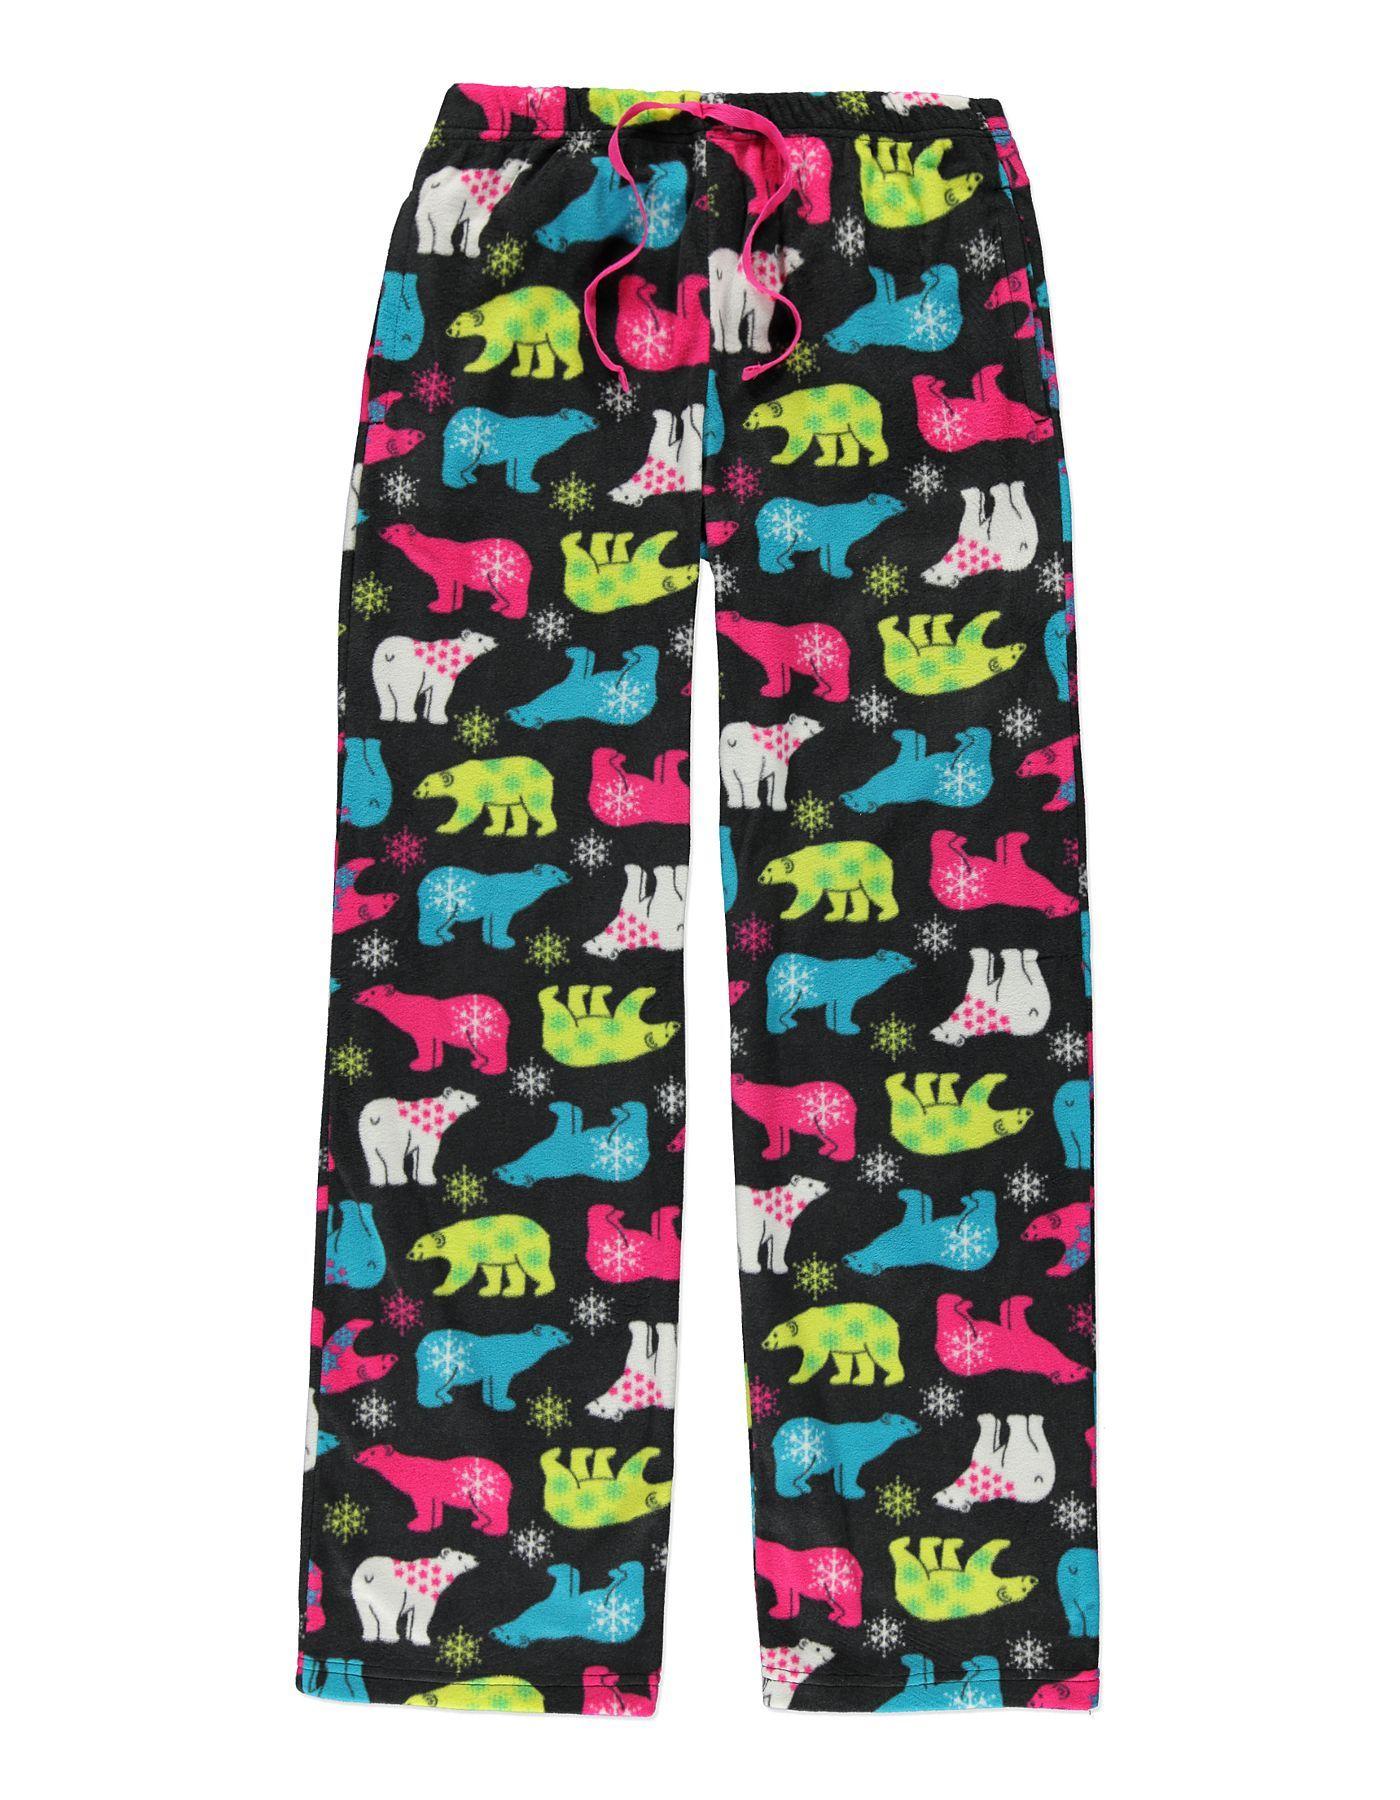 Polar Bear Print Fleece Pyjama Bottoms Women at